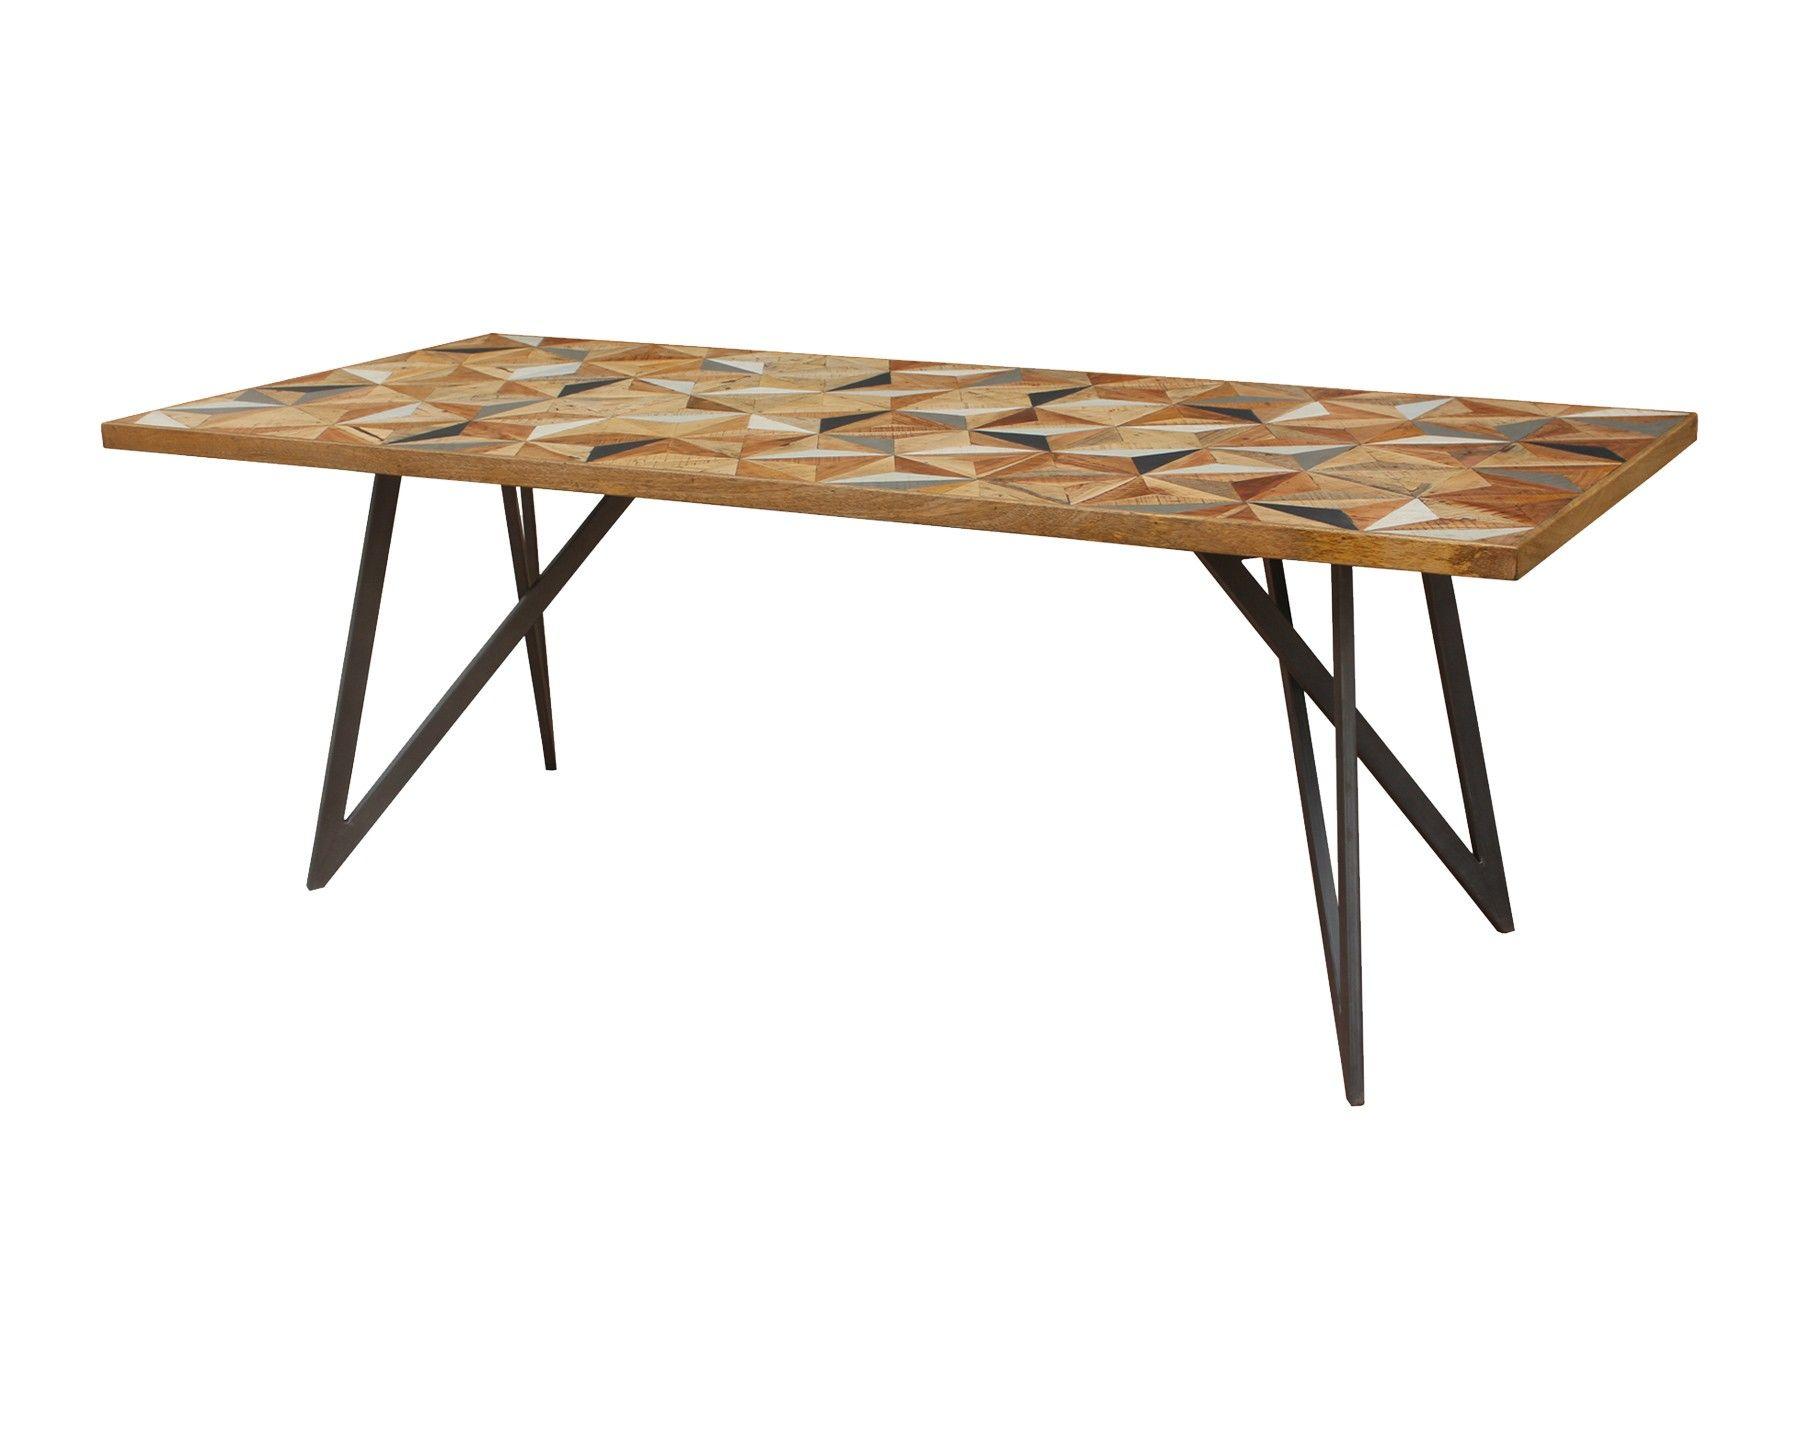 Vectori Dining Table - Dining Tables - Dining | Vast